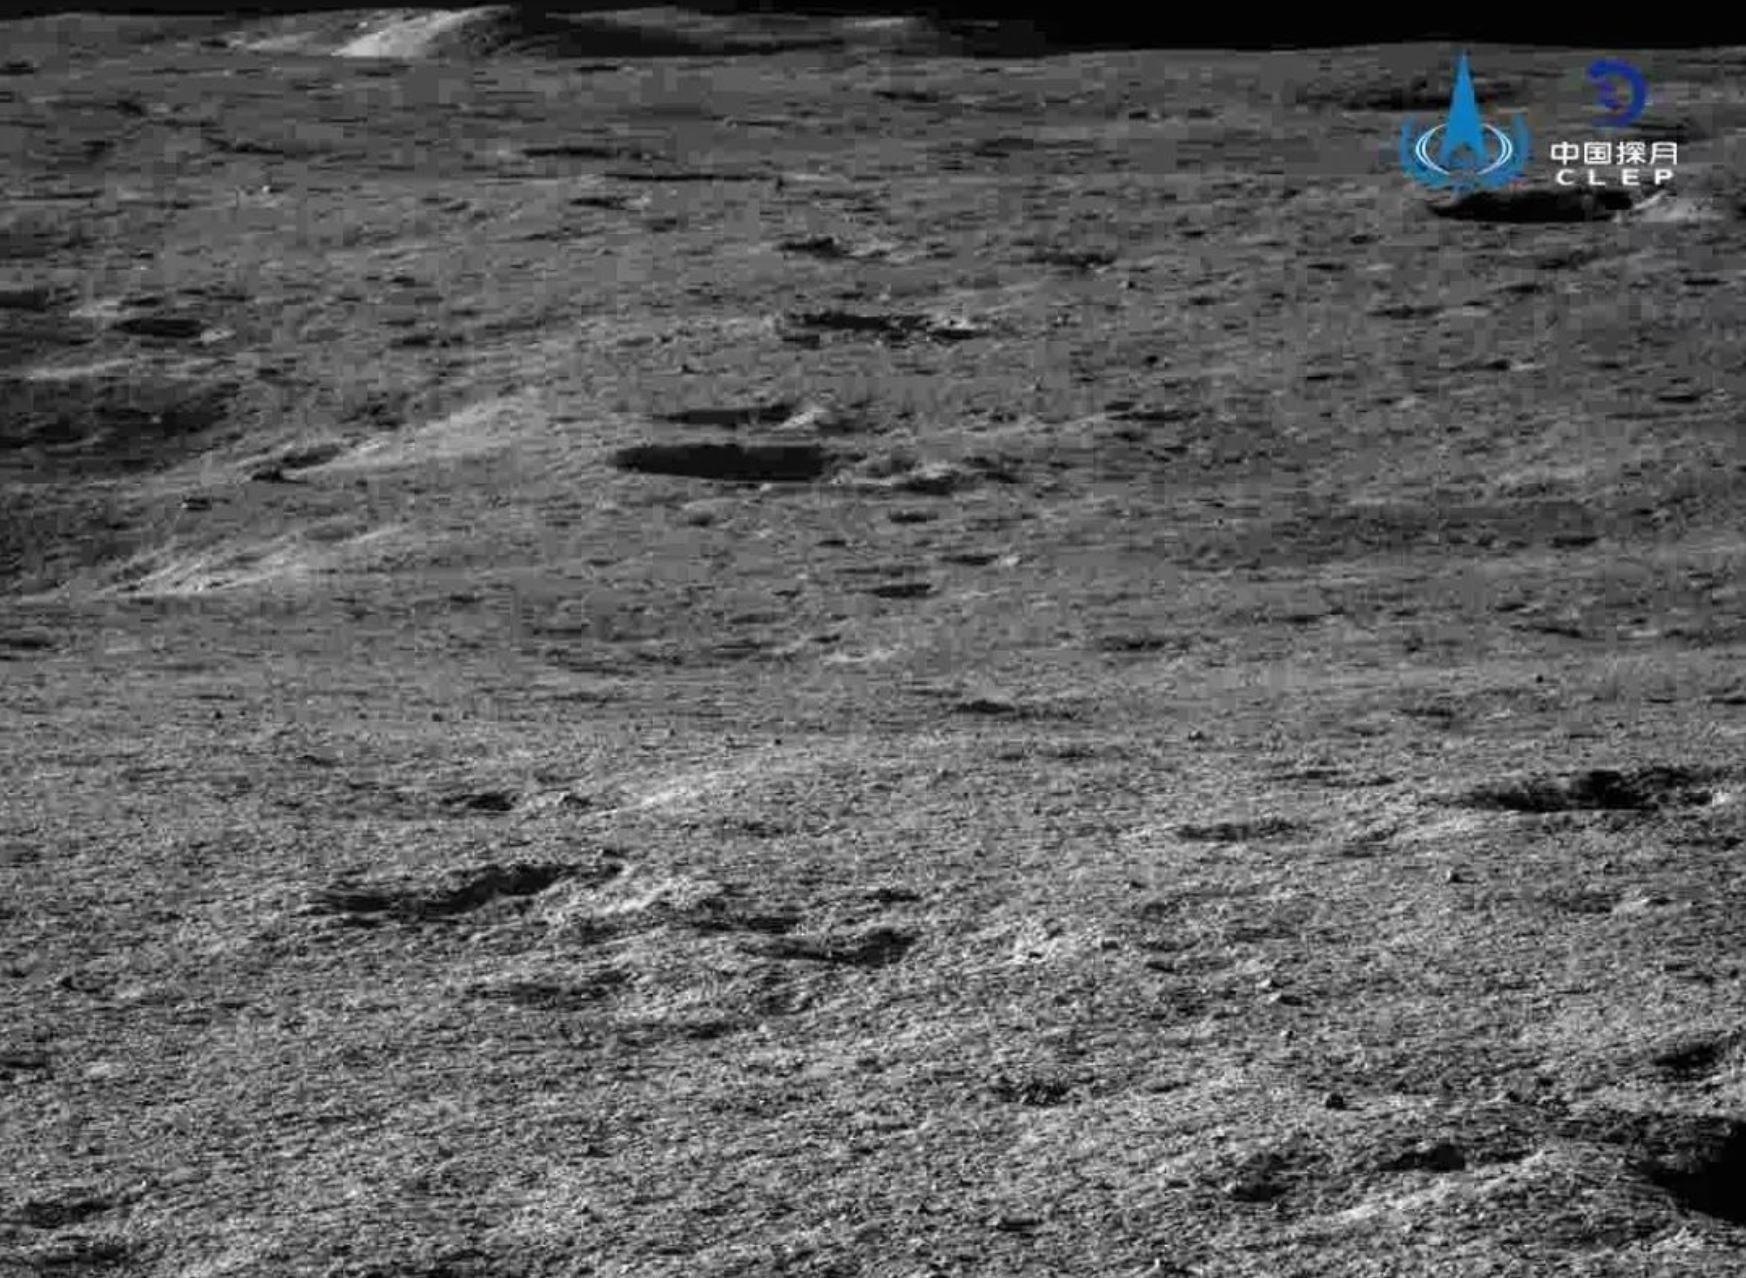 Revelan increíbles fotos de la cara oculta de la Luna